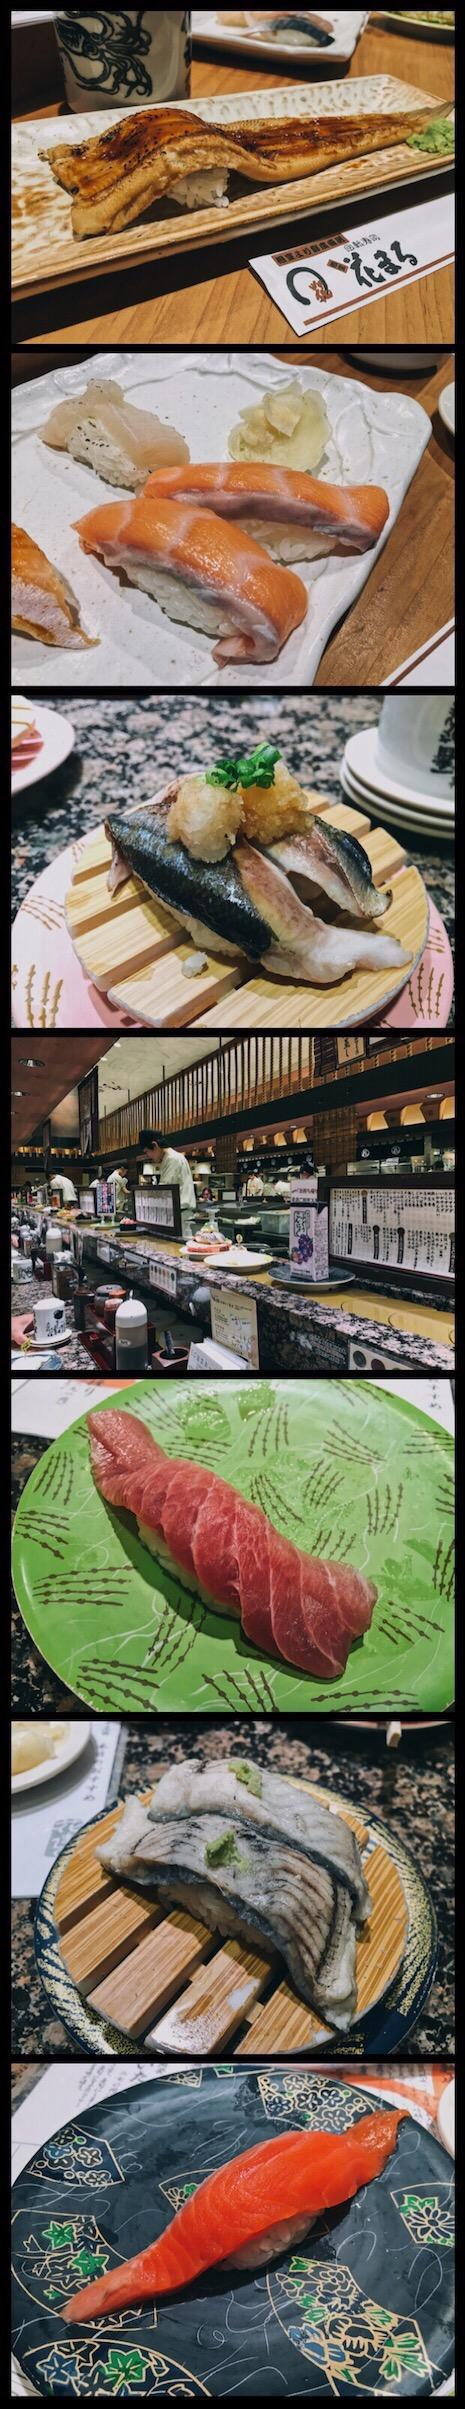 Hanamaru Rotation Sushi Sapporo Food